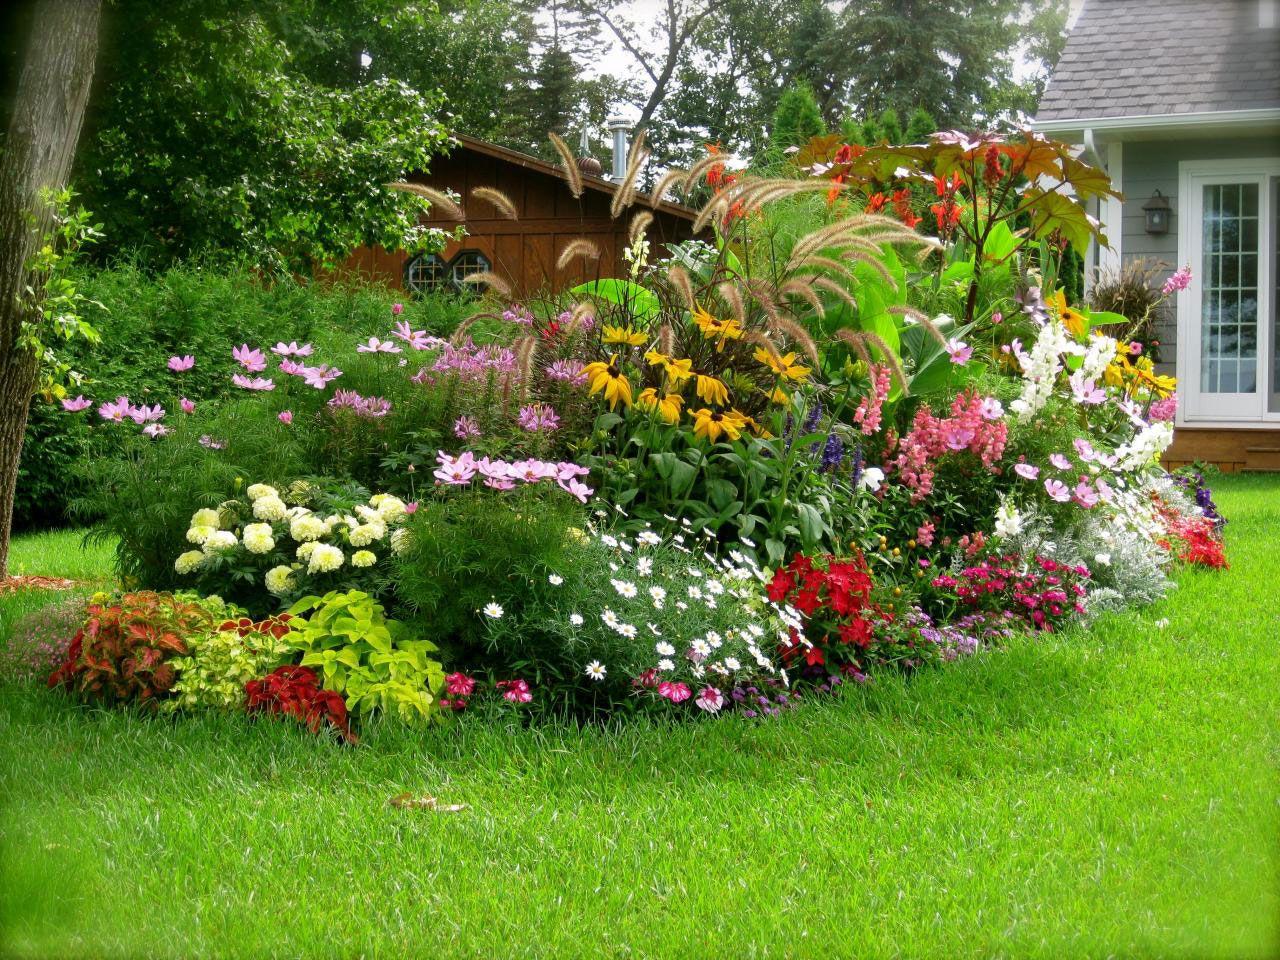 landscaping and garden ideas | landscape garden ideas,landscape garden  design,beautiful garden IJDBOOQ